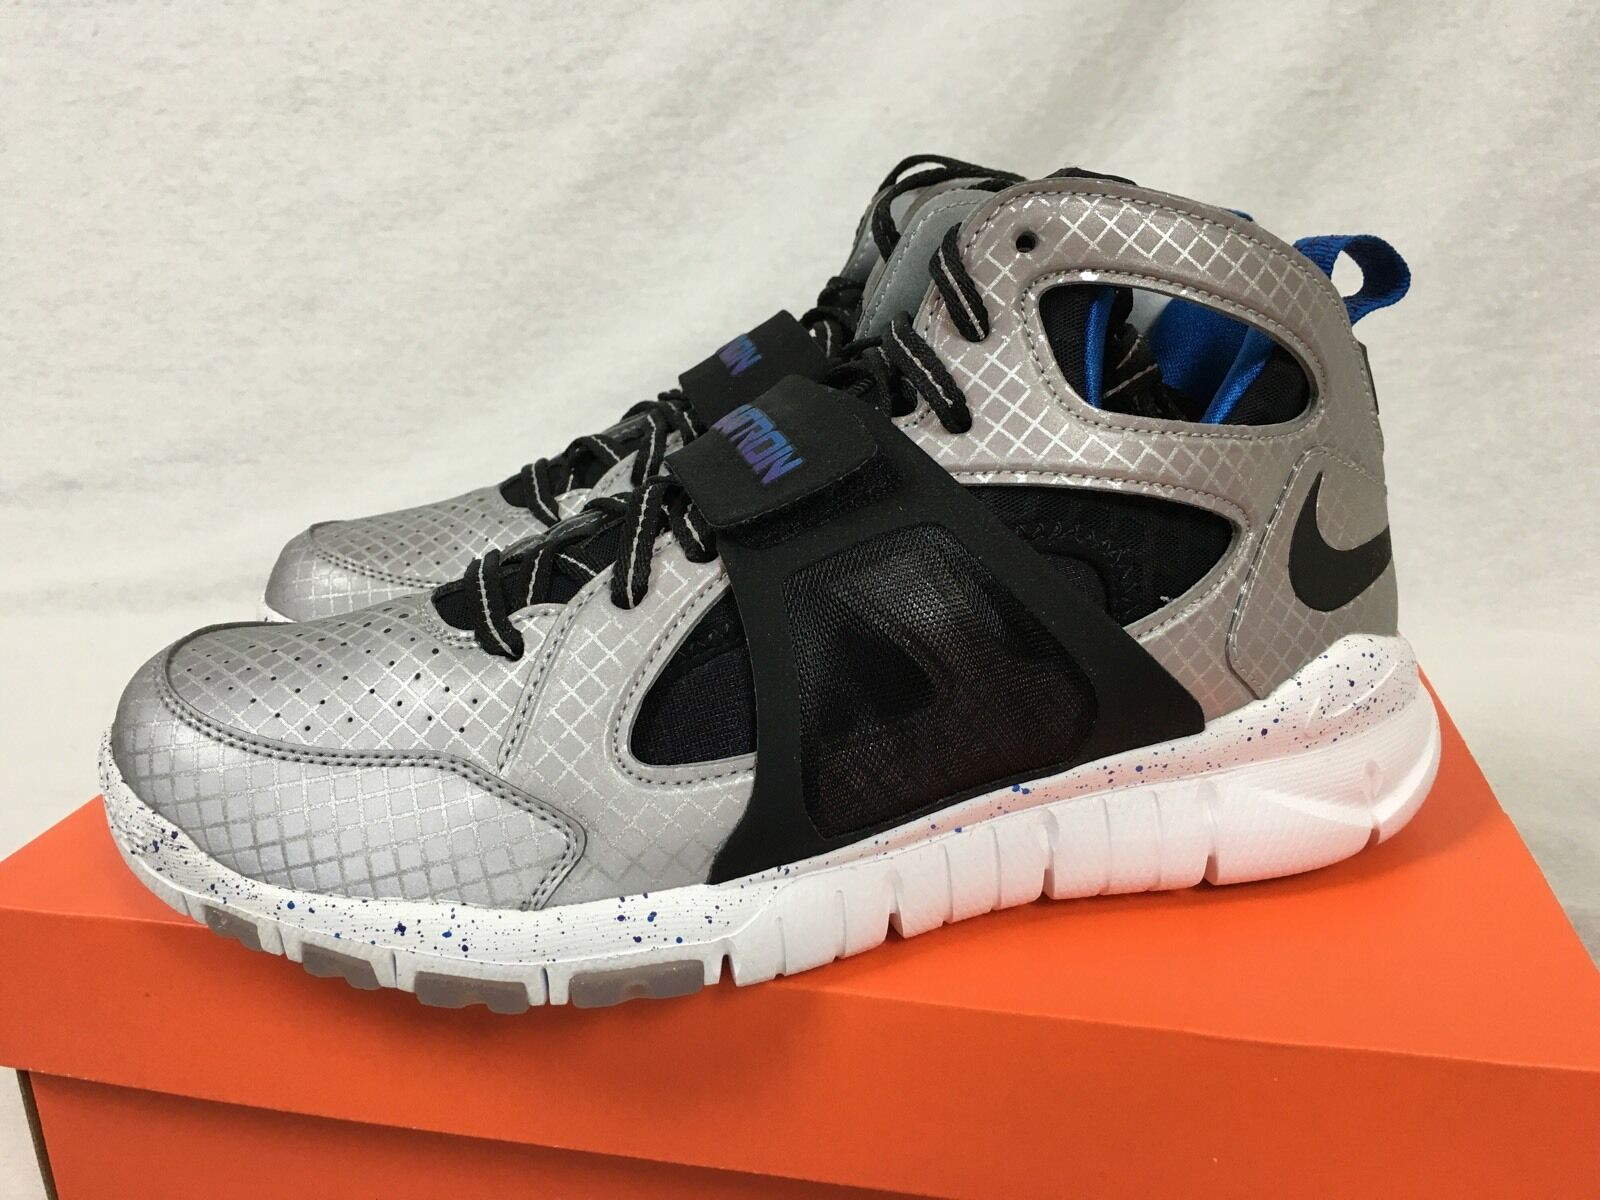 wholesale dealer b239f c74b4 Nike huarache free escudo Mega Mega Mega Megatron reducción de precios  estacionales de recortes de precios